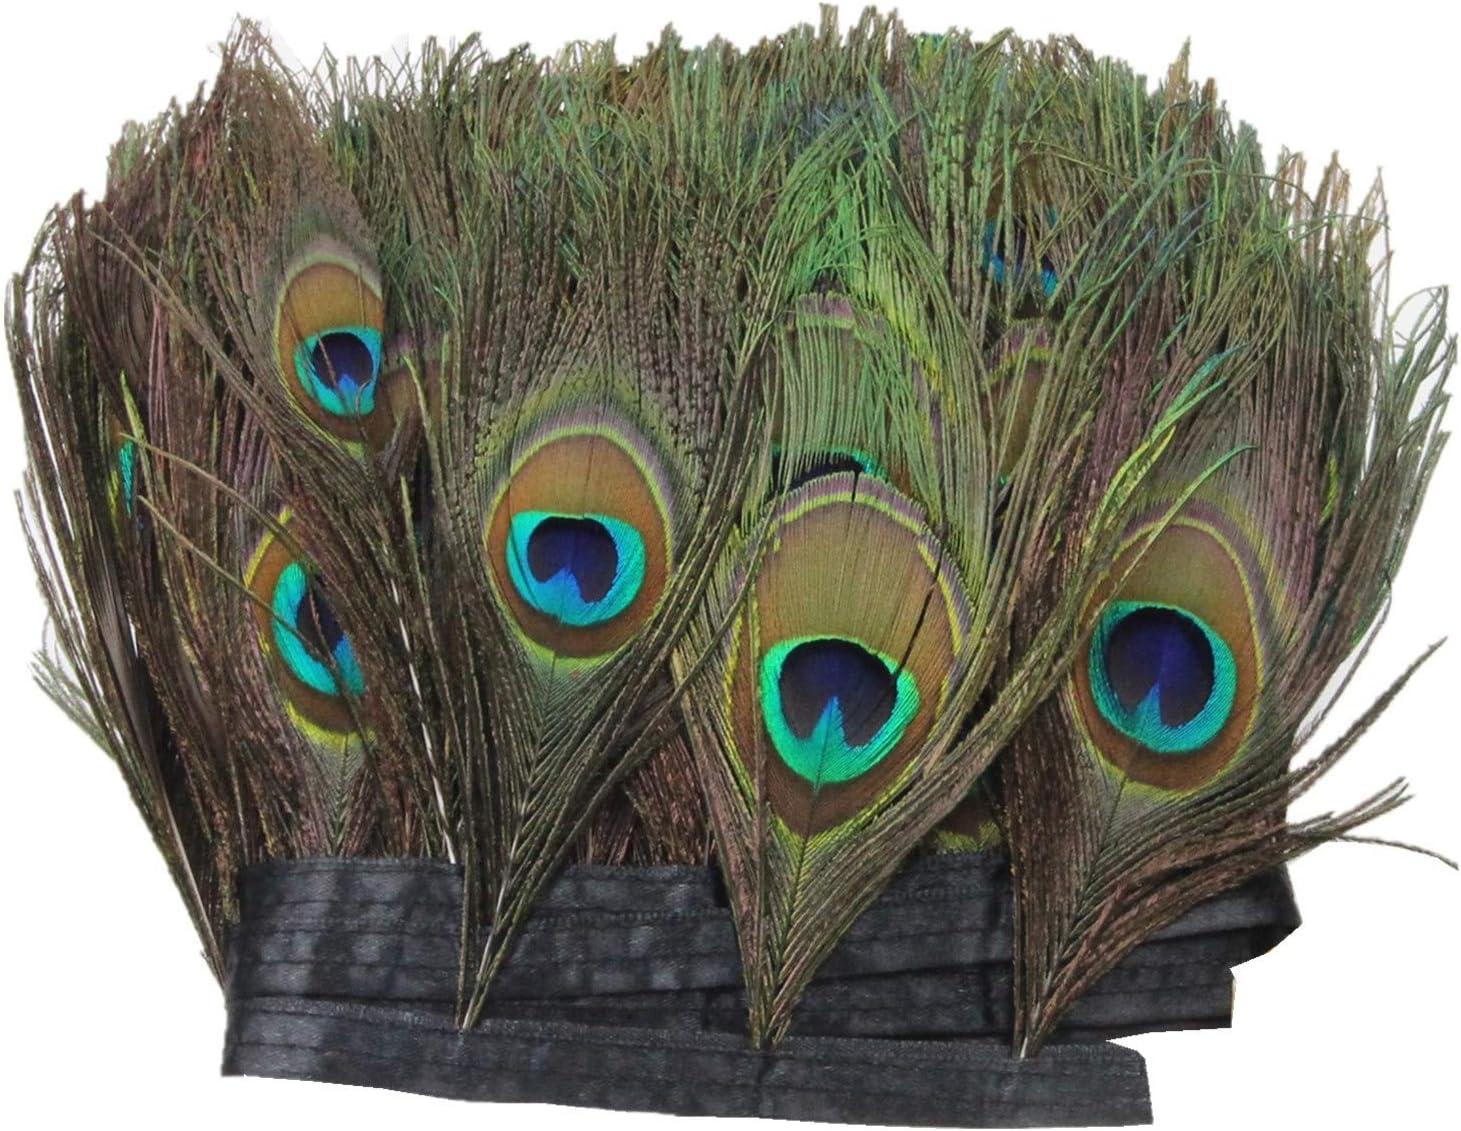 Piuma Maschera Occhi 3 piani PAVONE 2 Design Eye-Maschera Ballo In Maschera Maschera